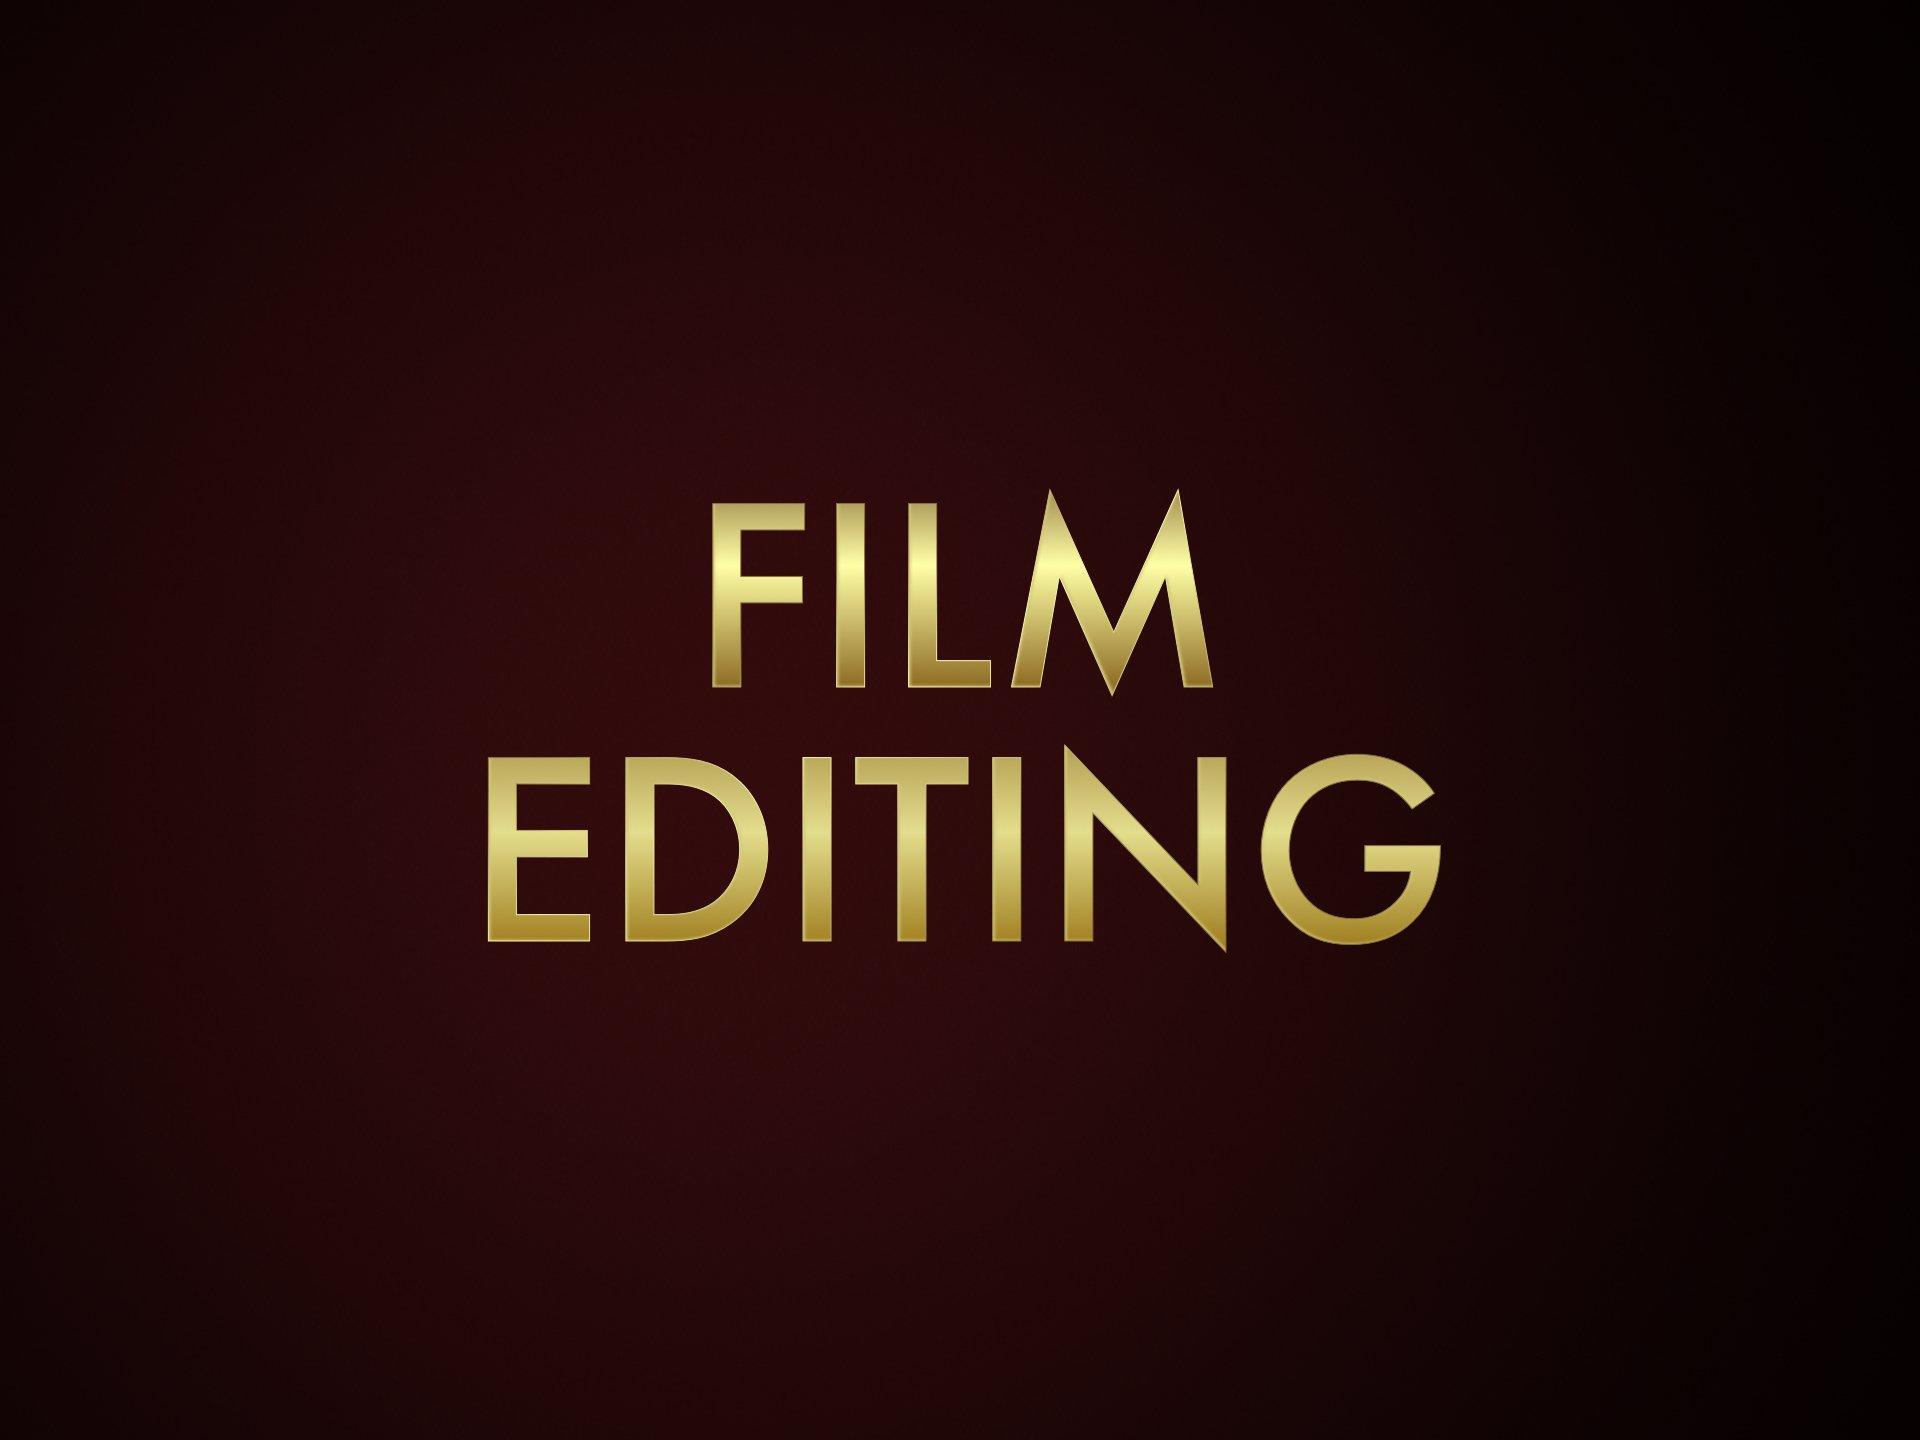 Film Editing Oscar Nominations 2020   Oscars 2020 News 92nd 1920x1440